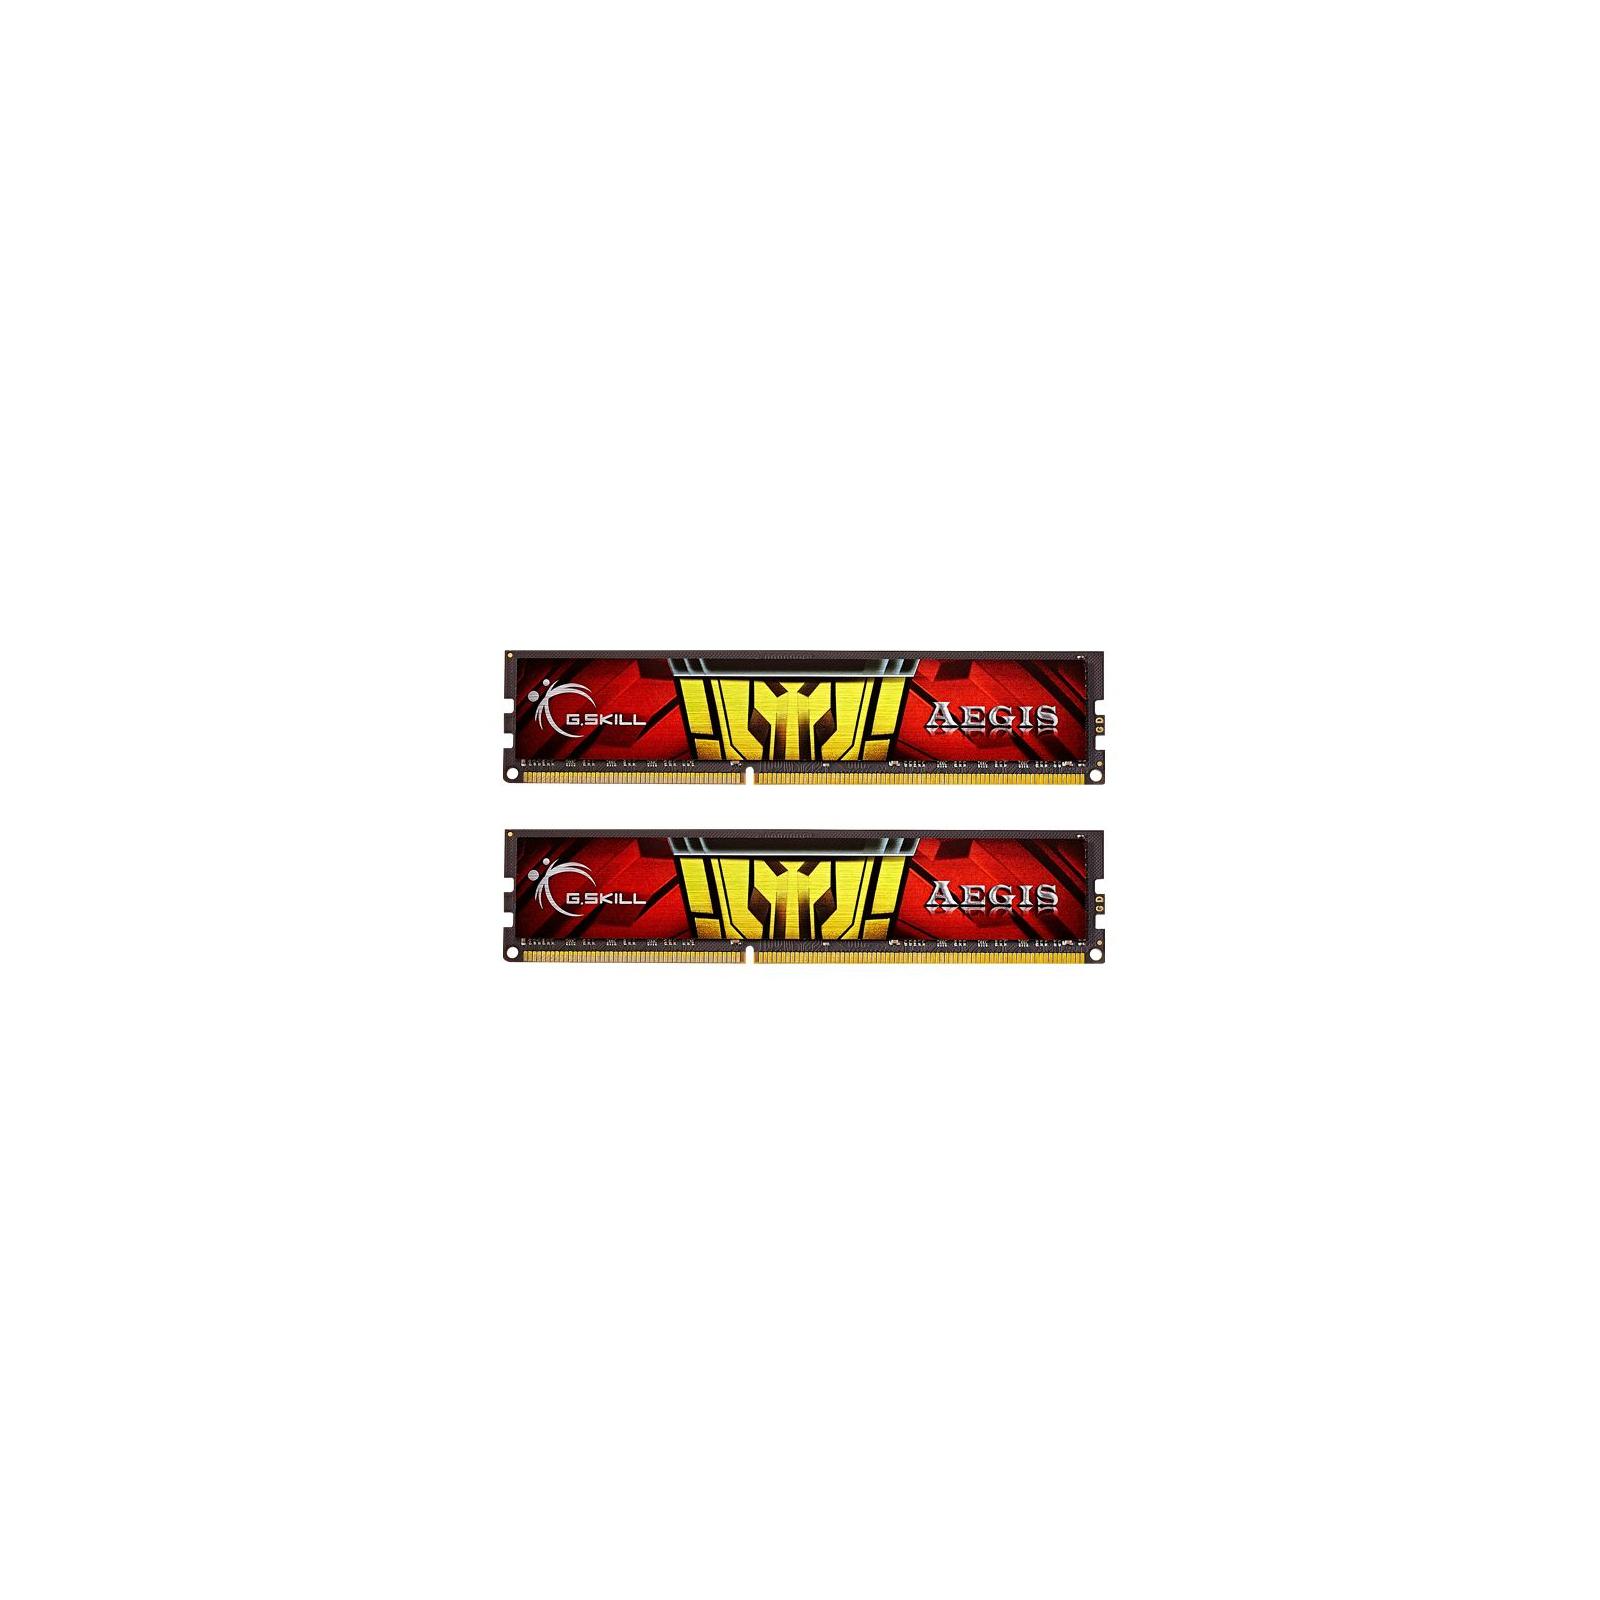 Модуль памяти для компьютера DDR3 16GB (2x8GB) 1333 MHz G.Skill (F3-1333C9D-16GIS)